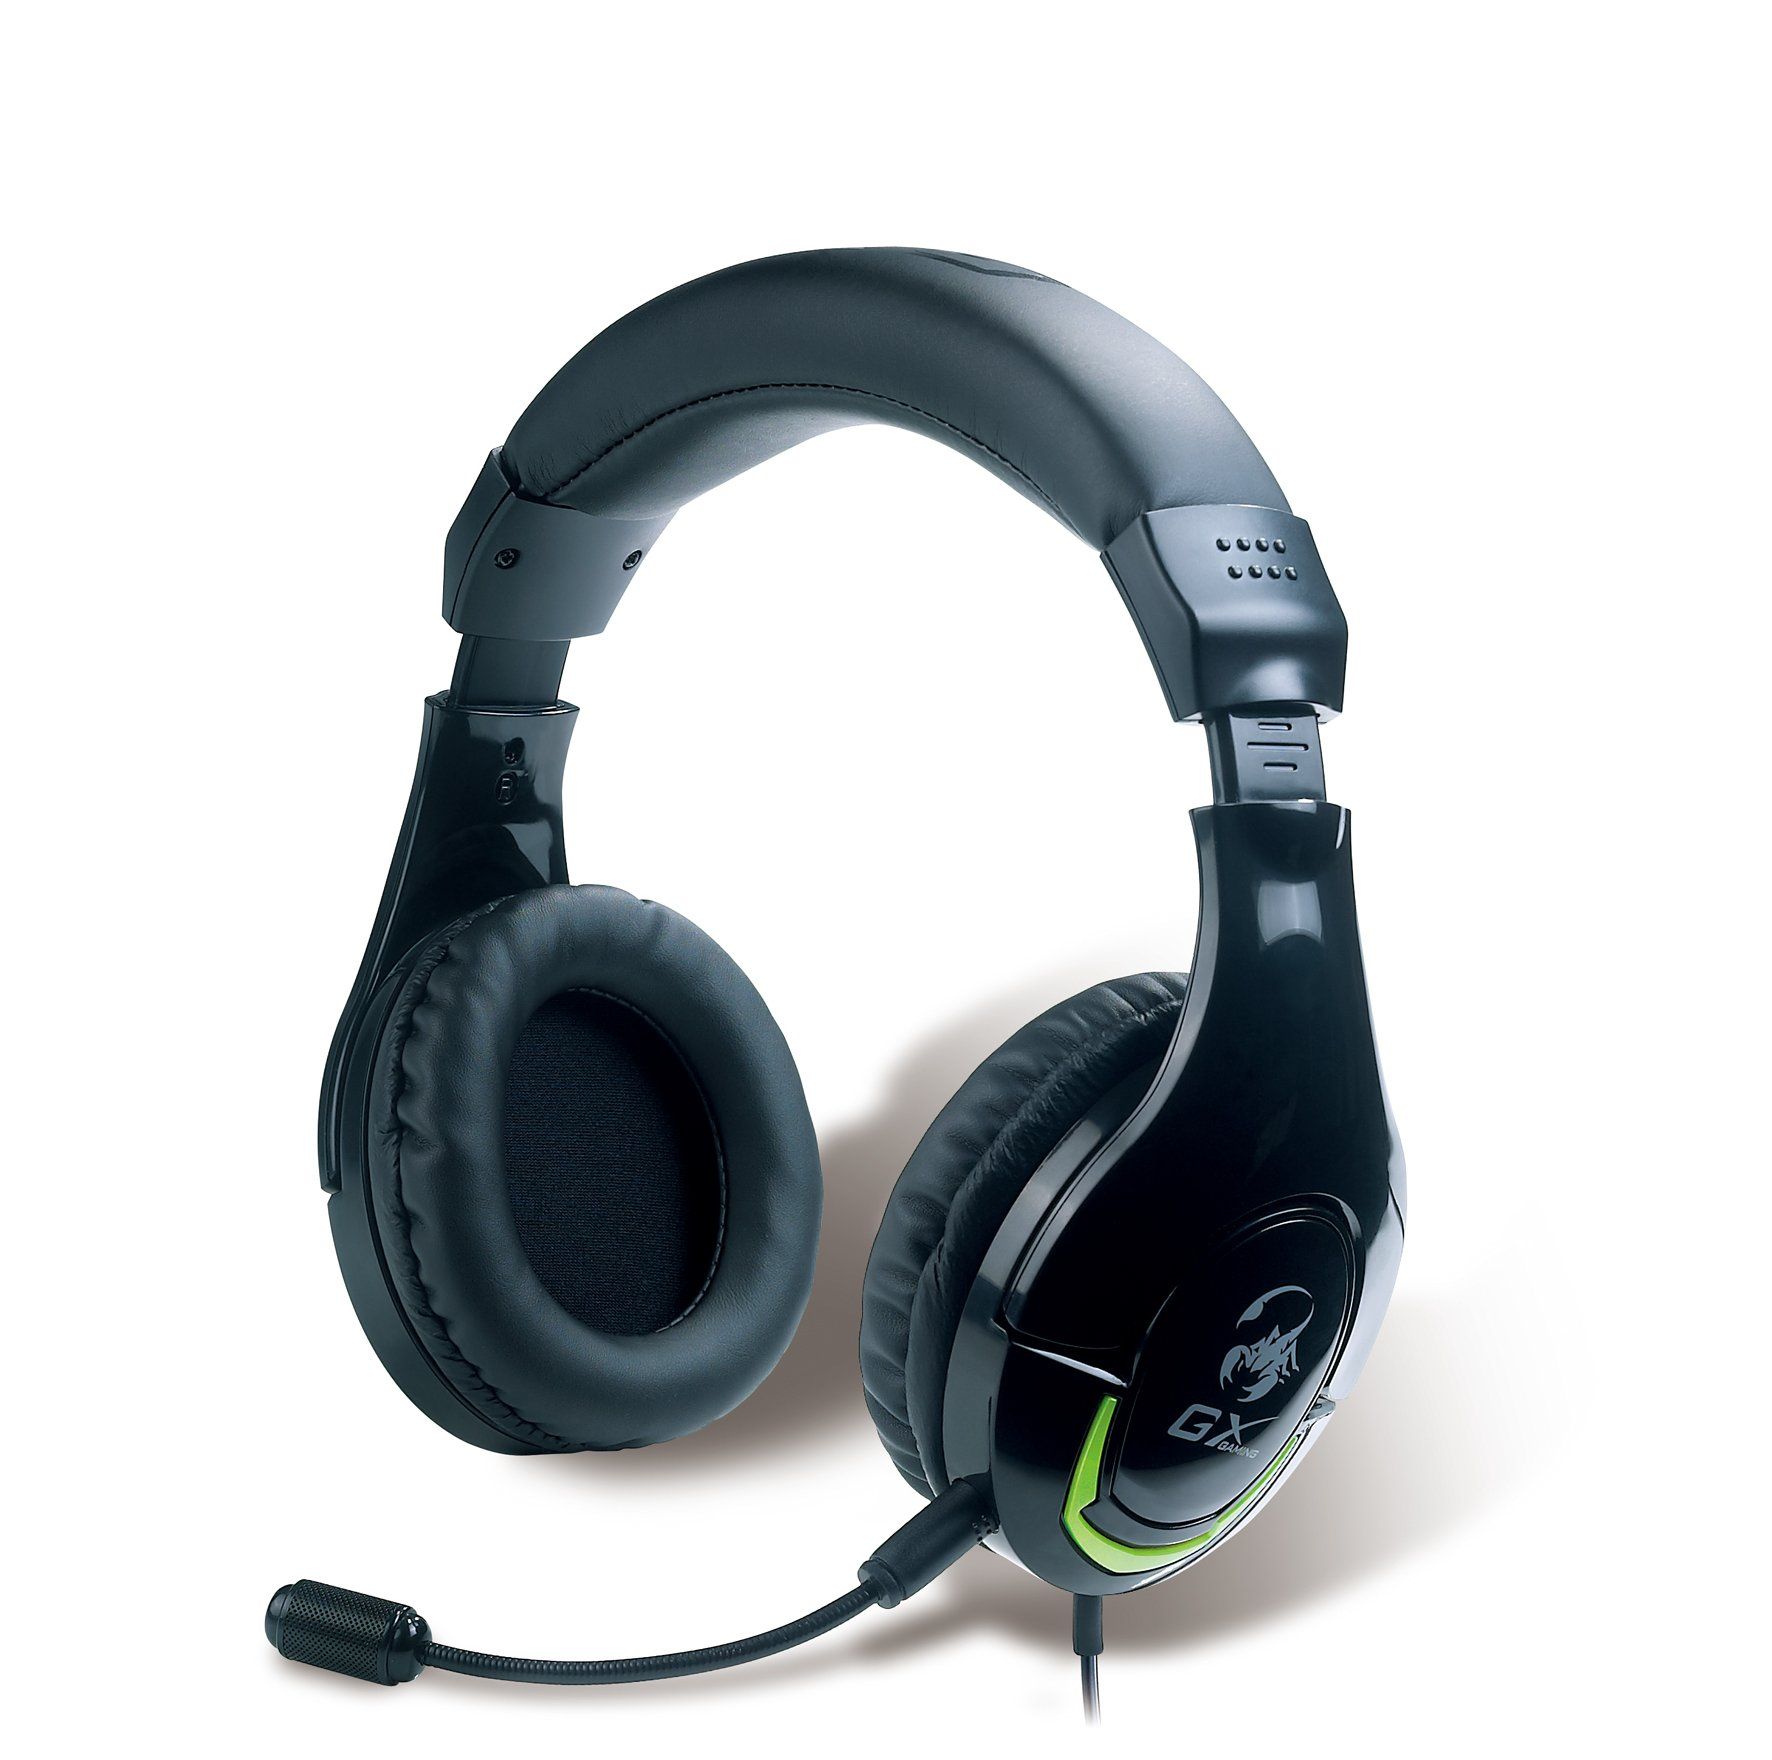 Genius GX-Gaming Mordax Gaming Headset for Mac, PC, PS3, XBOX360 (MORDAX HS-G600)